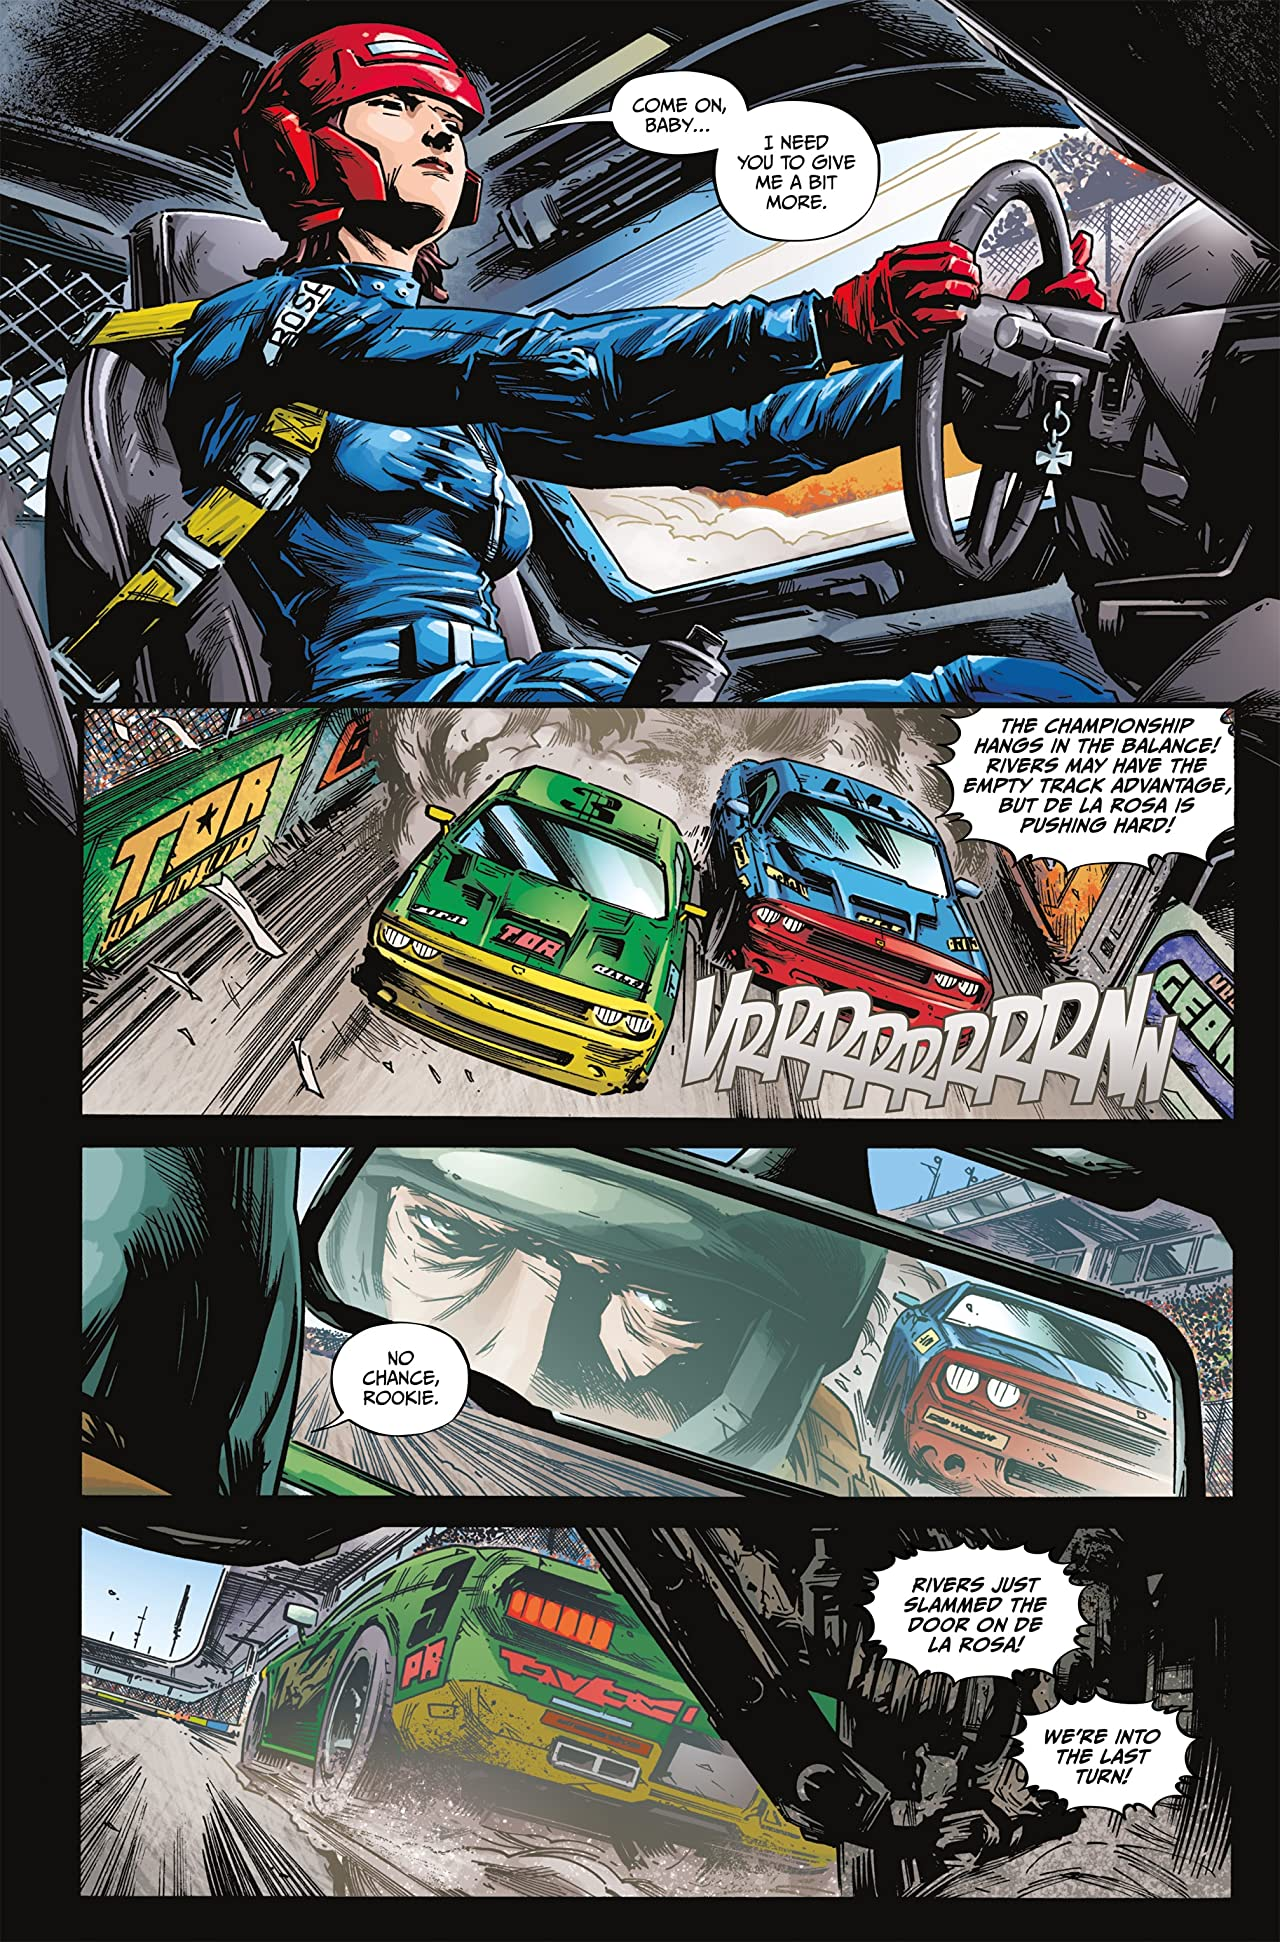 Freeway Fighter Vol. 1